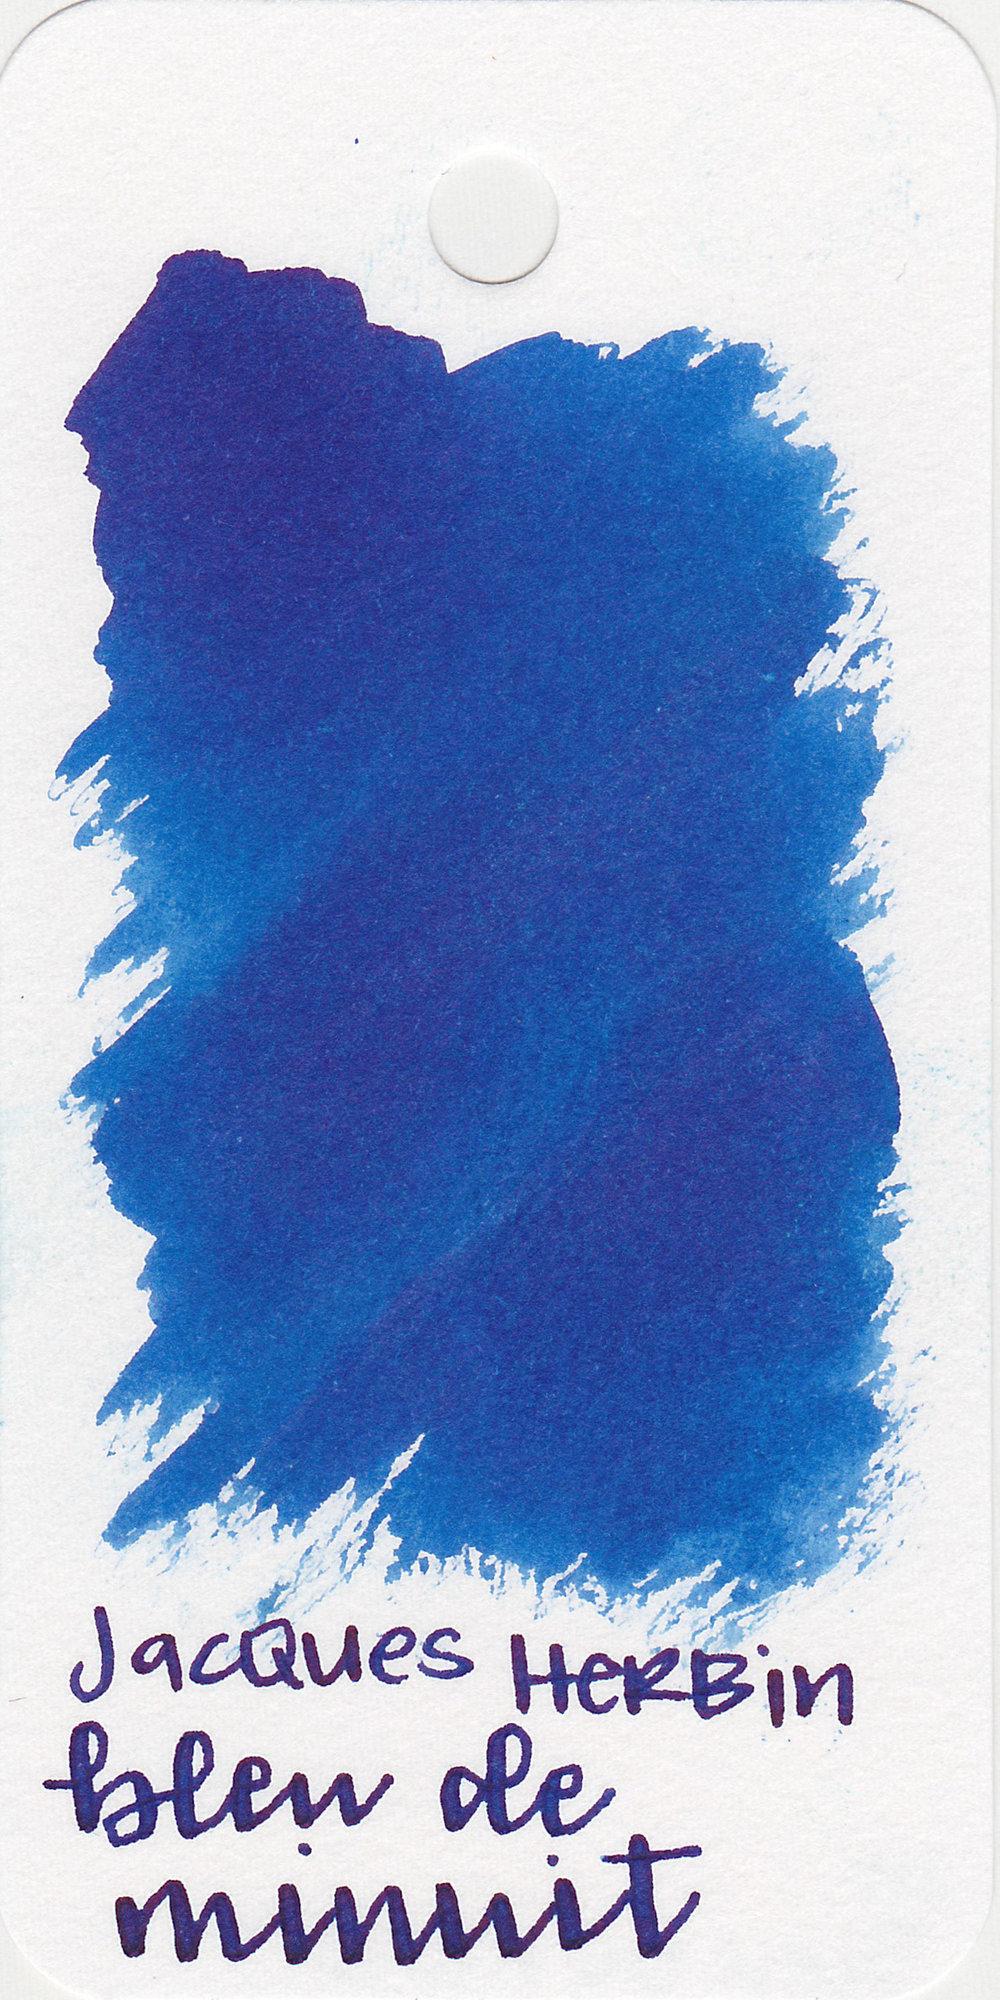 The color: - Bleu de Minuit is a pretty, medium blue.